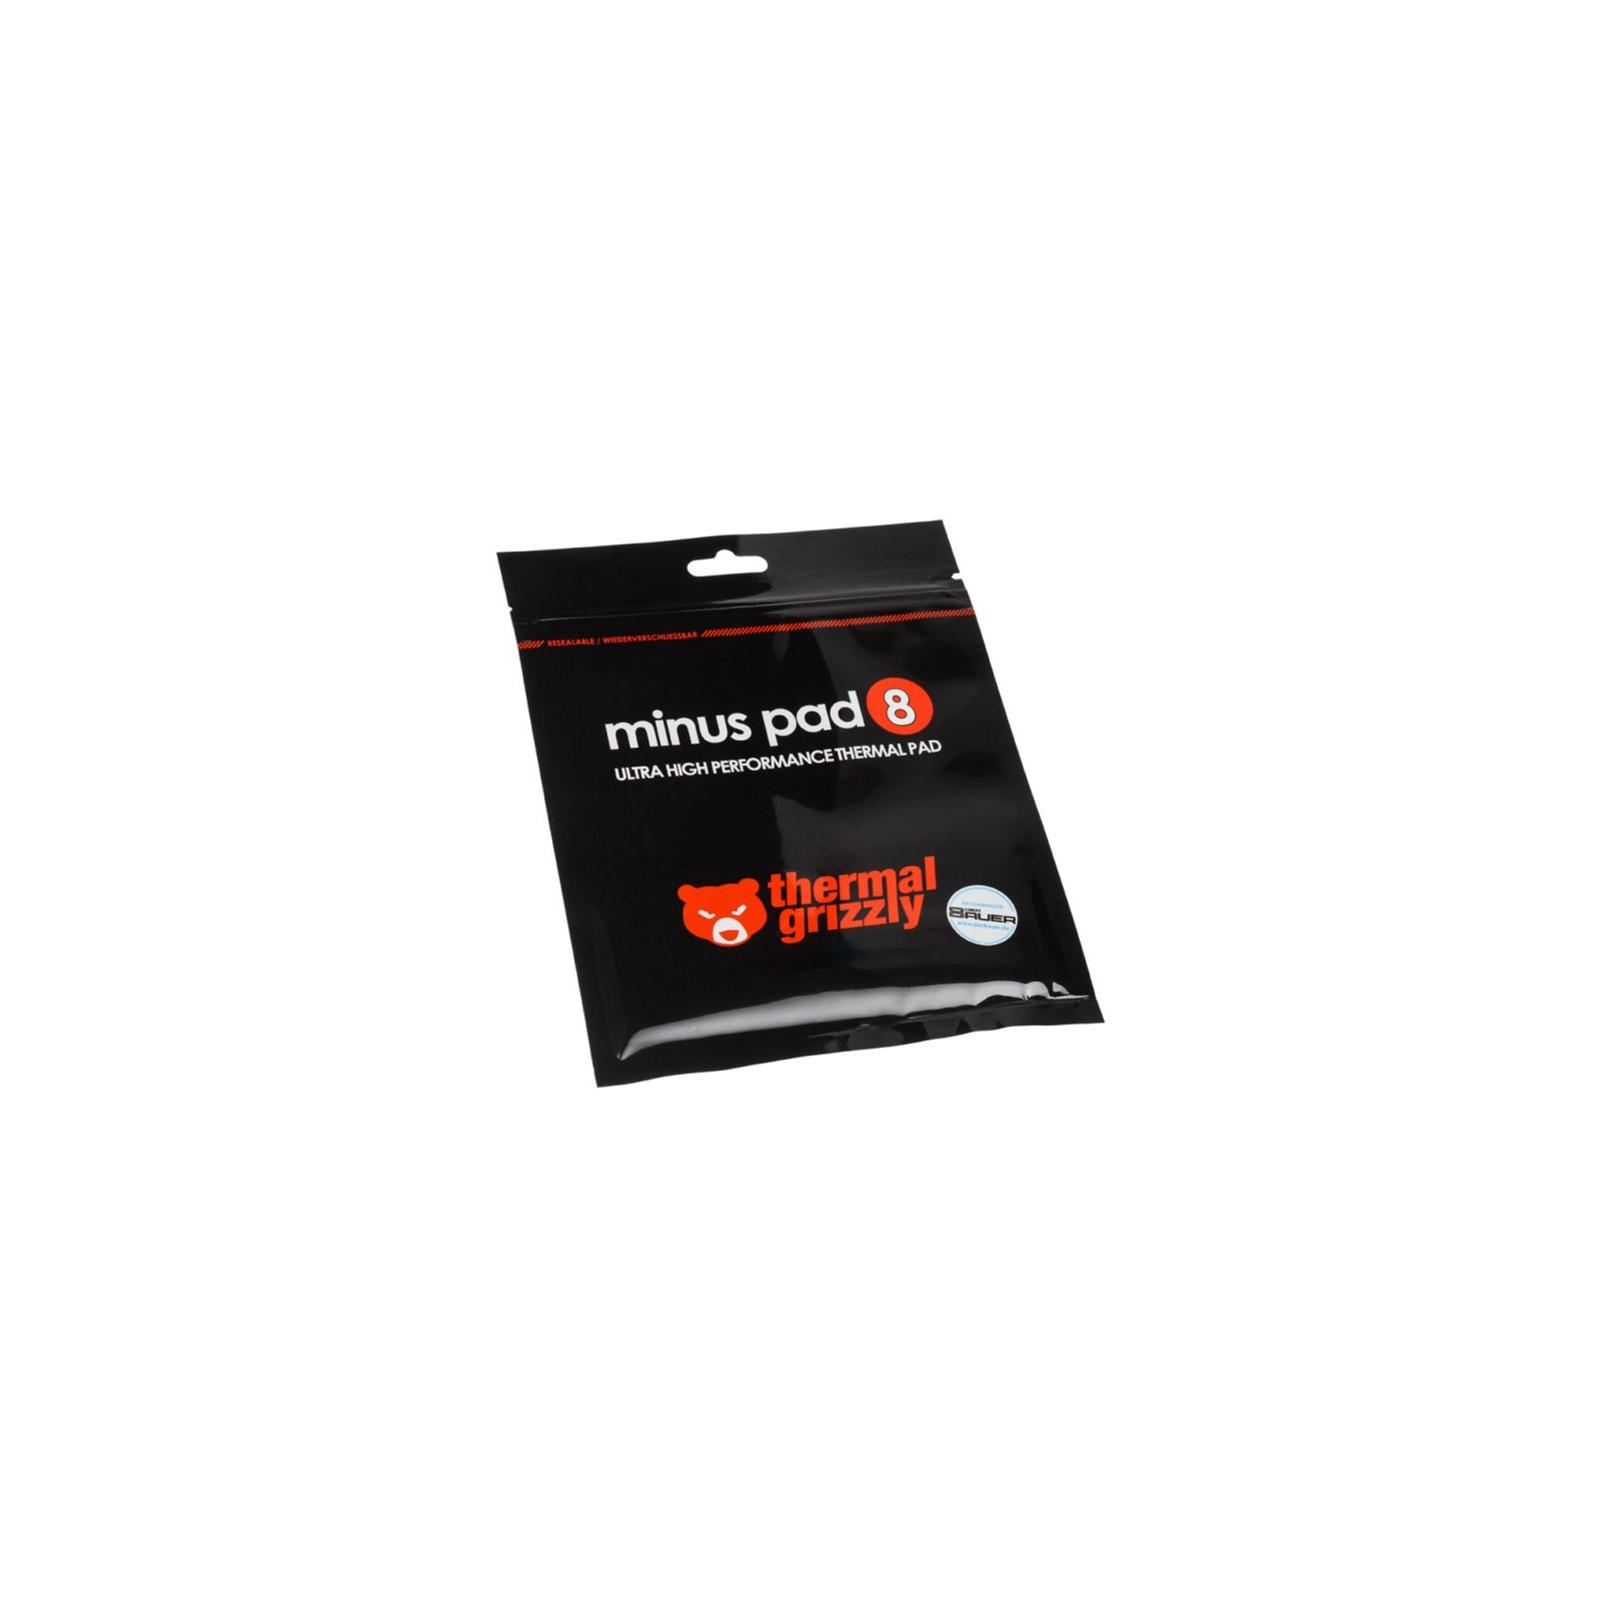 Термопрокладка Thermal Grizzly Minus Pad 8 120x20x1.5 mm (TG-MP8-120-20-15-1R) изображение 2